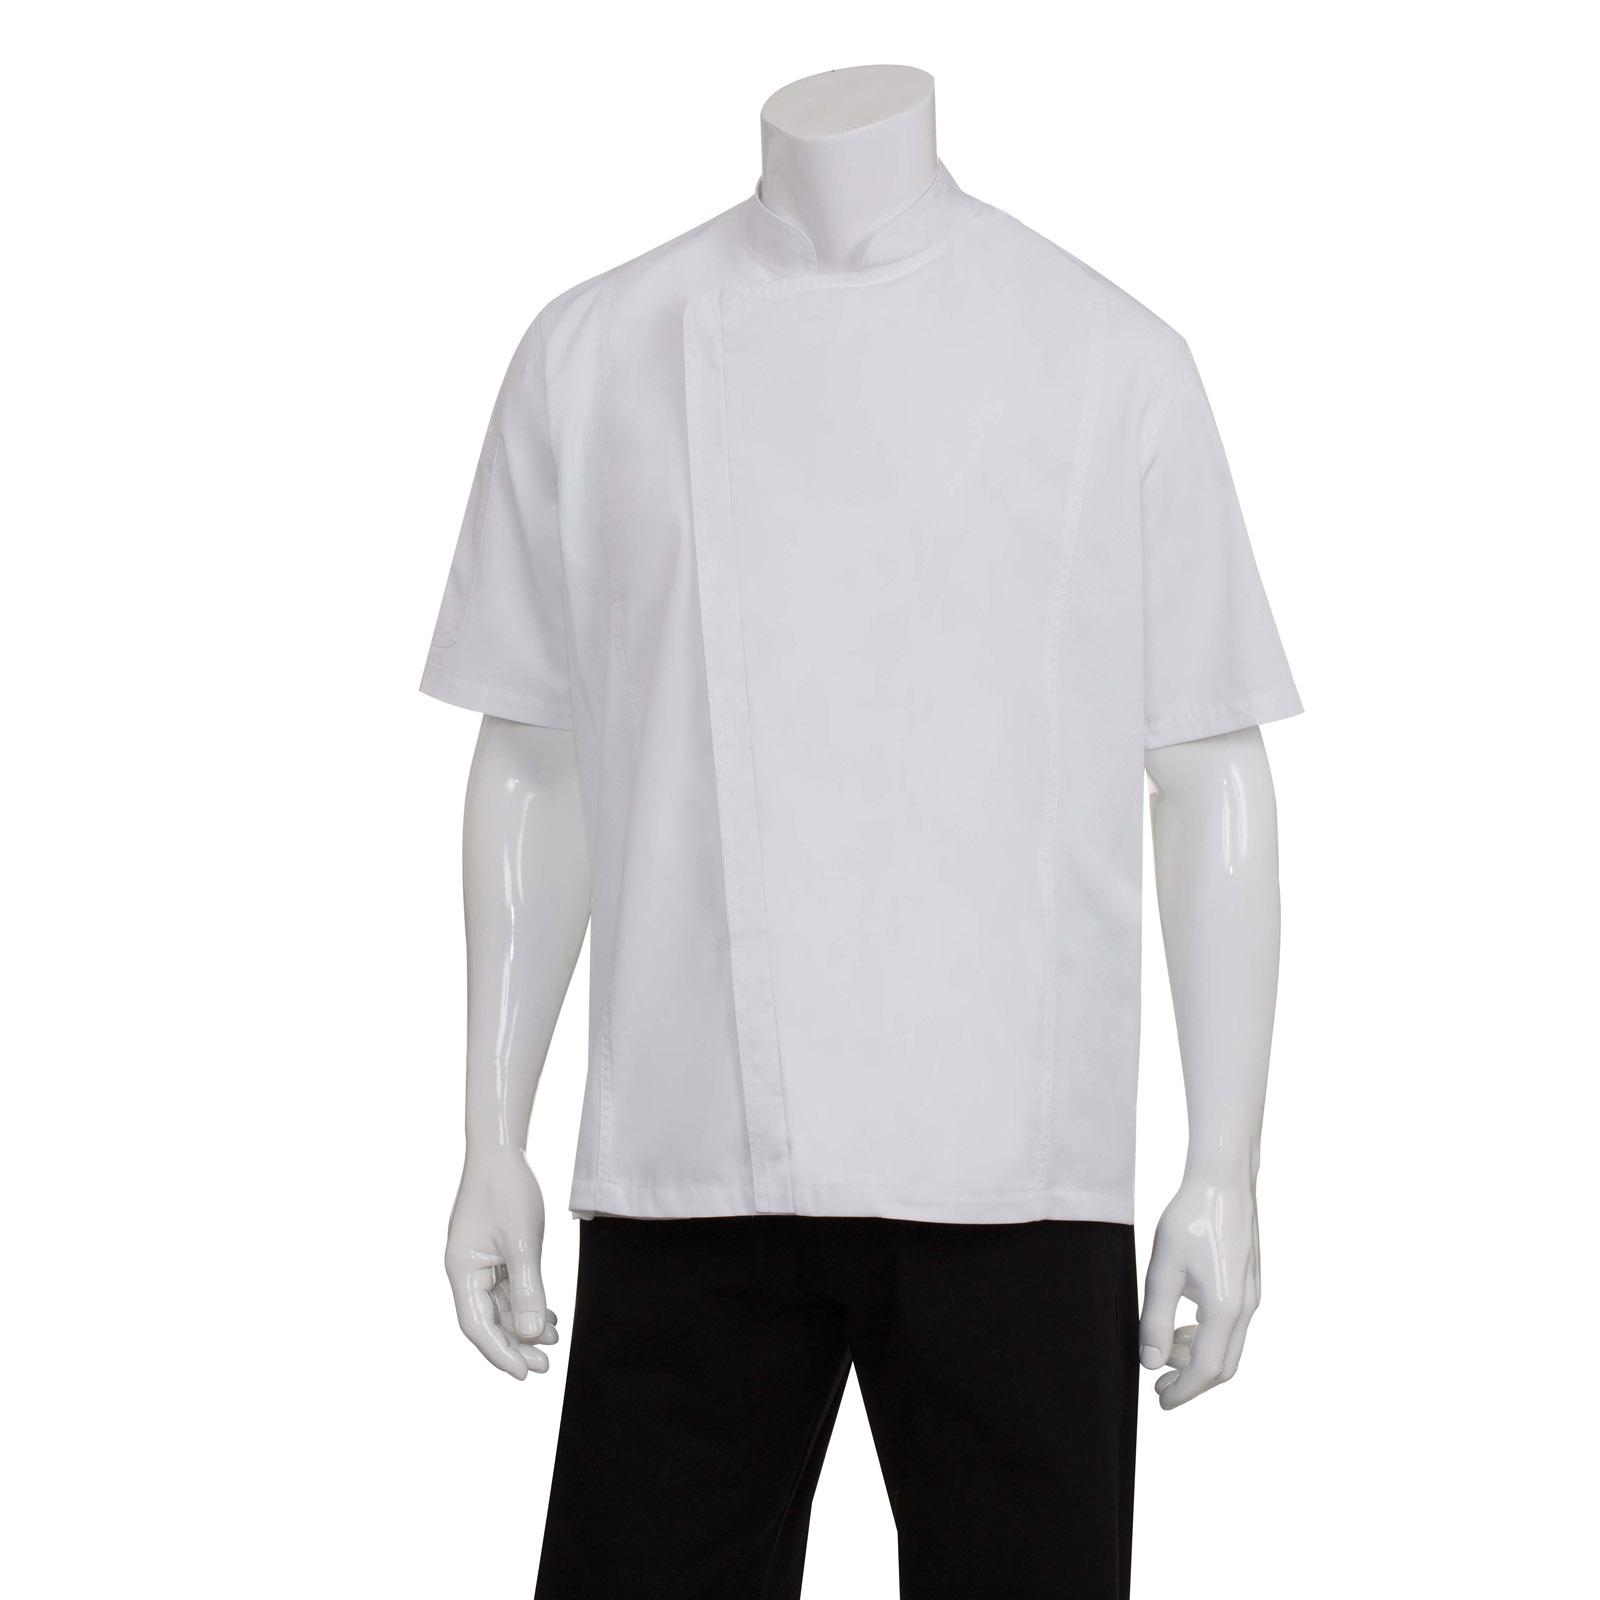 Chef Works BCSZ009WHT4XL chef's coat